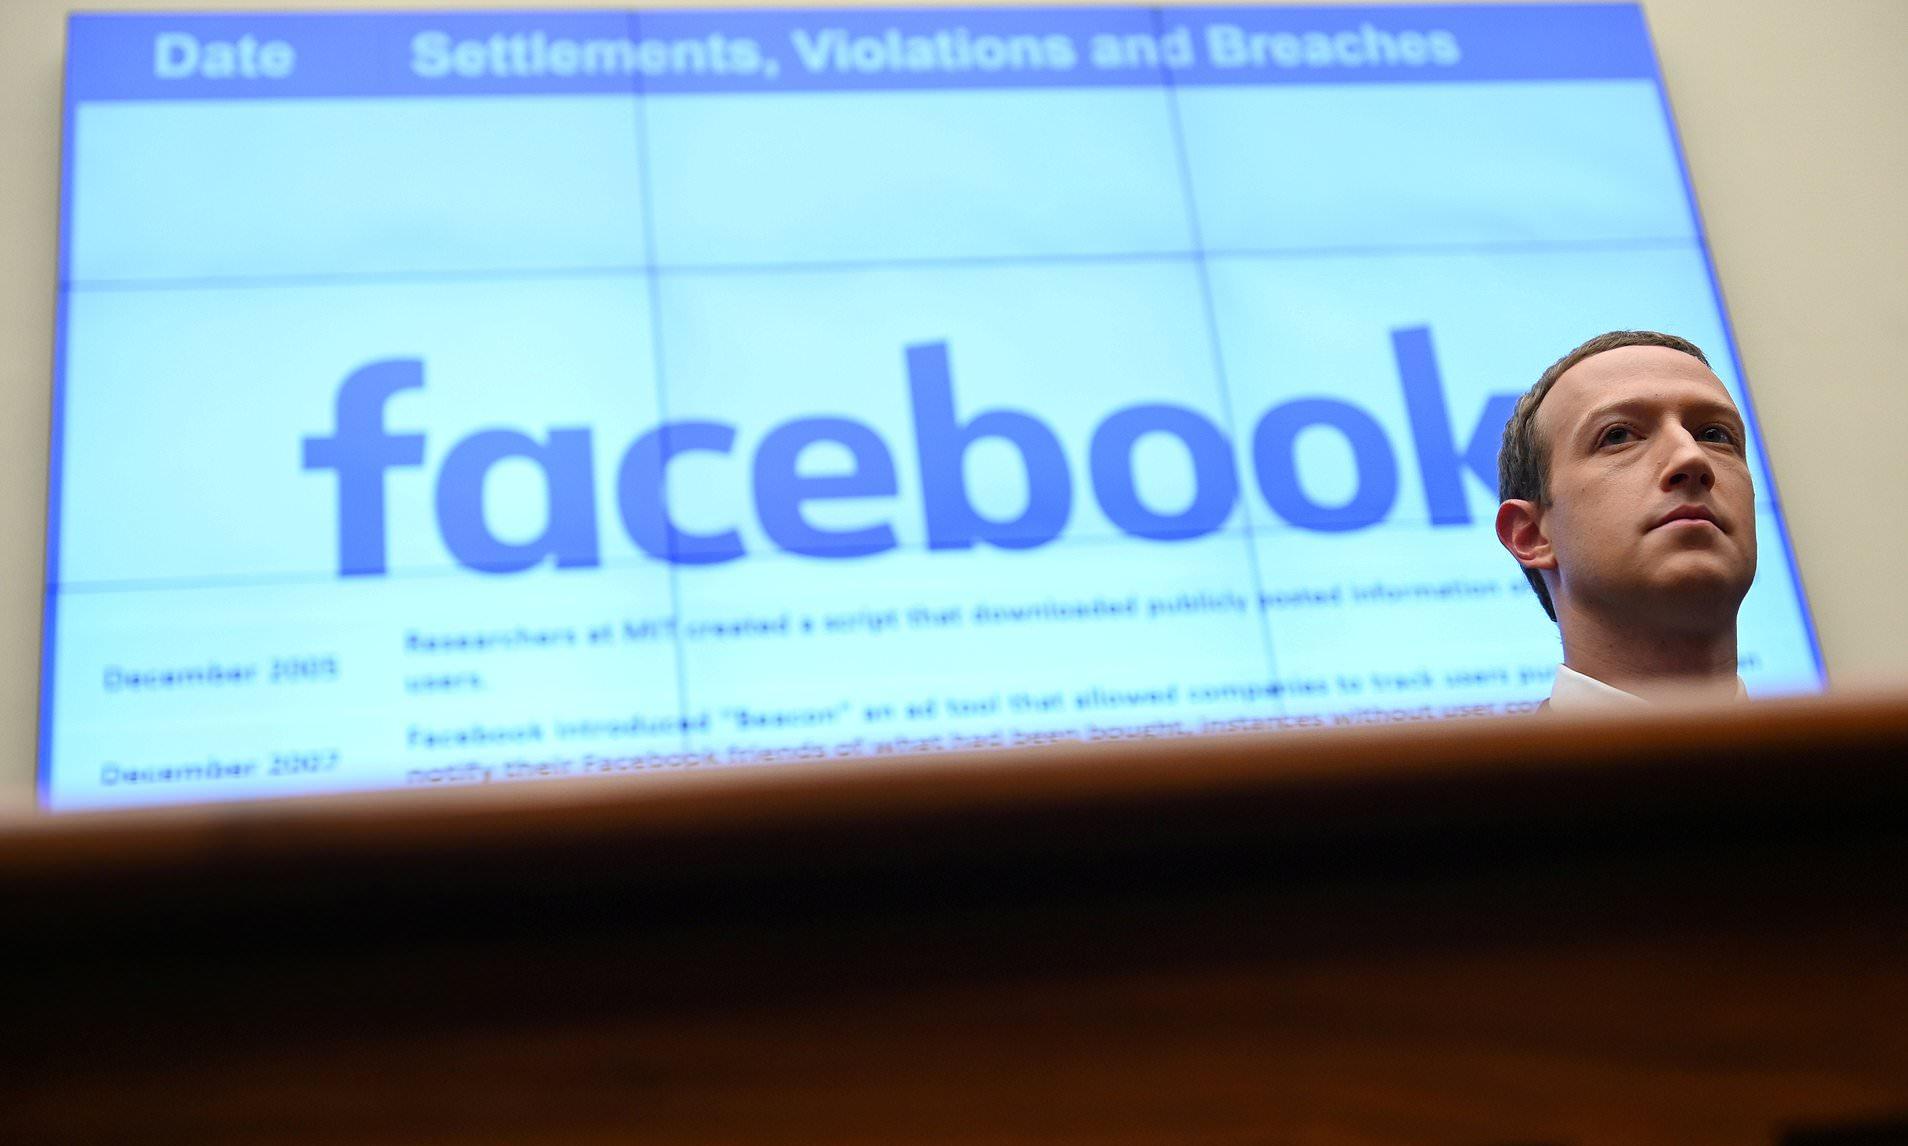 Facebook Postpones It's Naming Oversight Of Board Members Until 2020